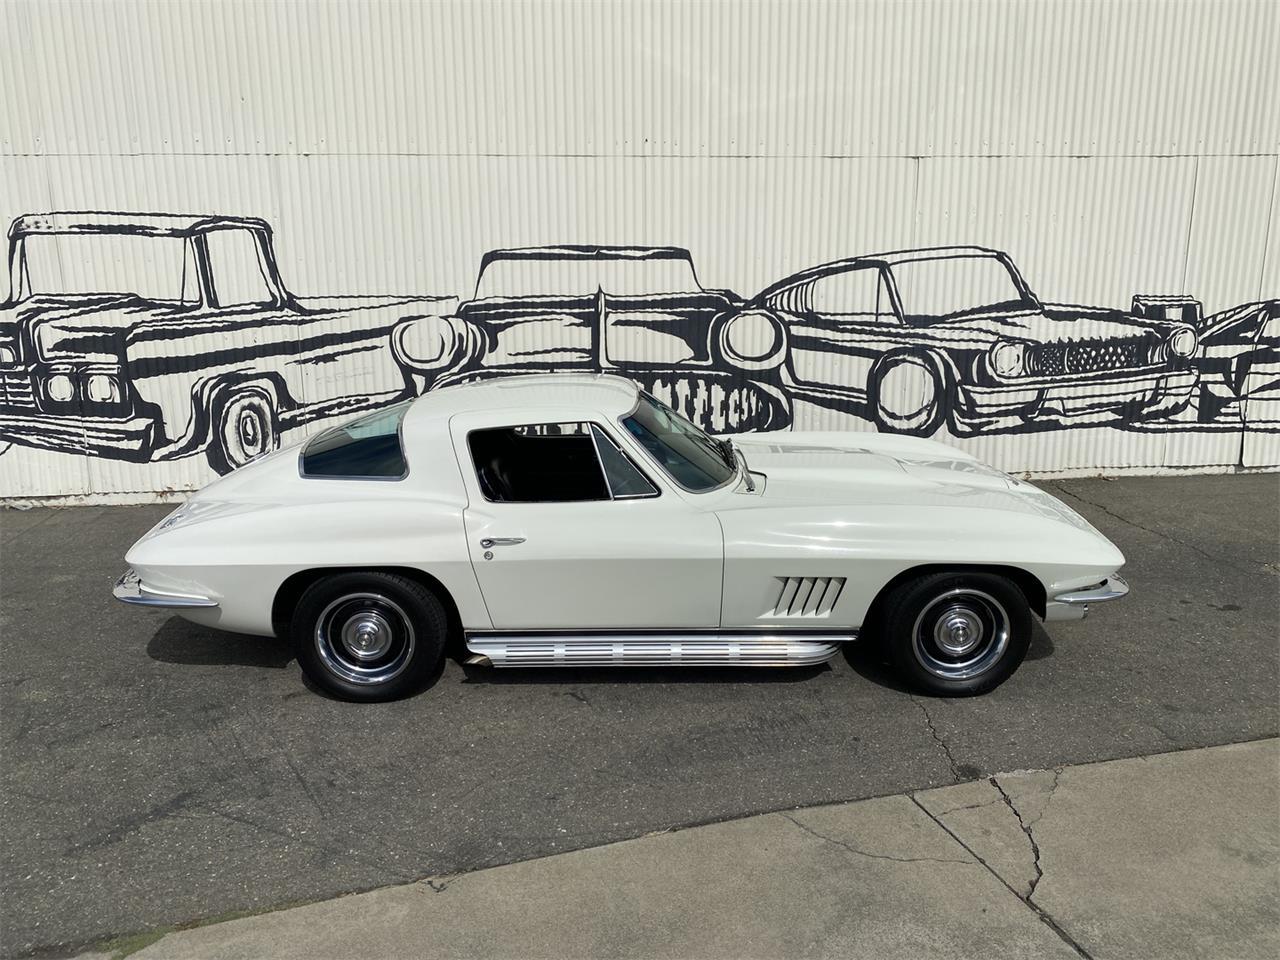 1967 Chevrolet Corvette (CC-1414291) for sale in Fairfield, California